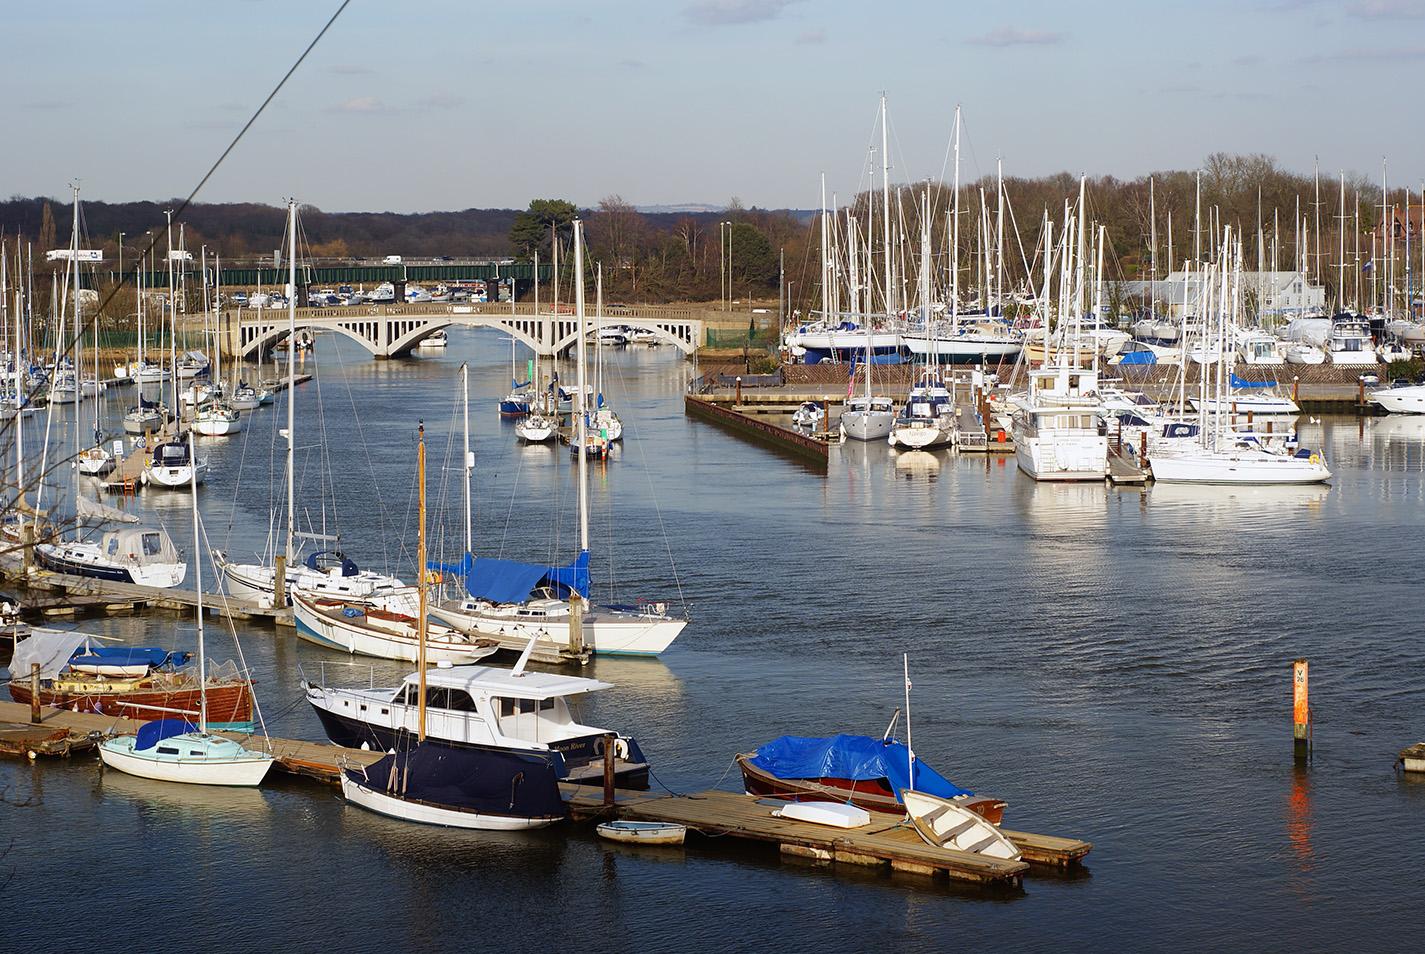 Sailndream : location de voiliers en Angleterre, location de bateaux en Angleterre